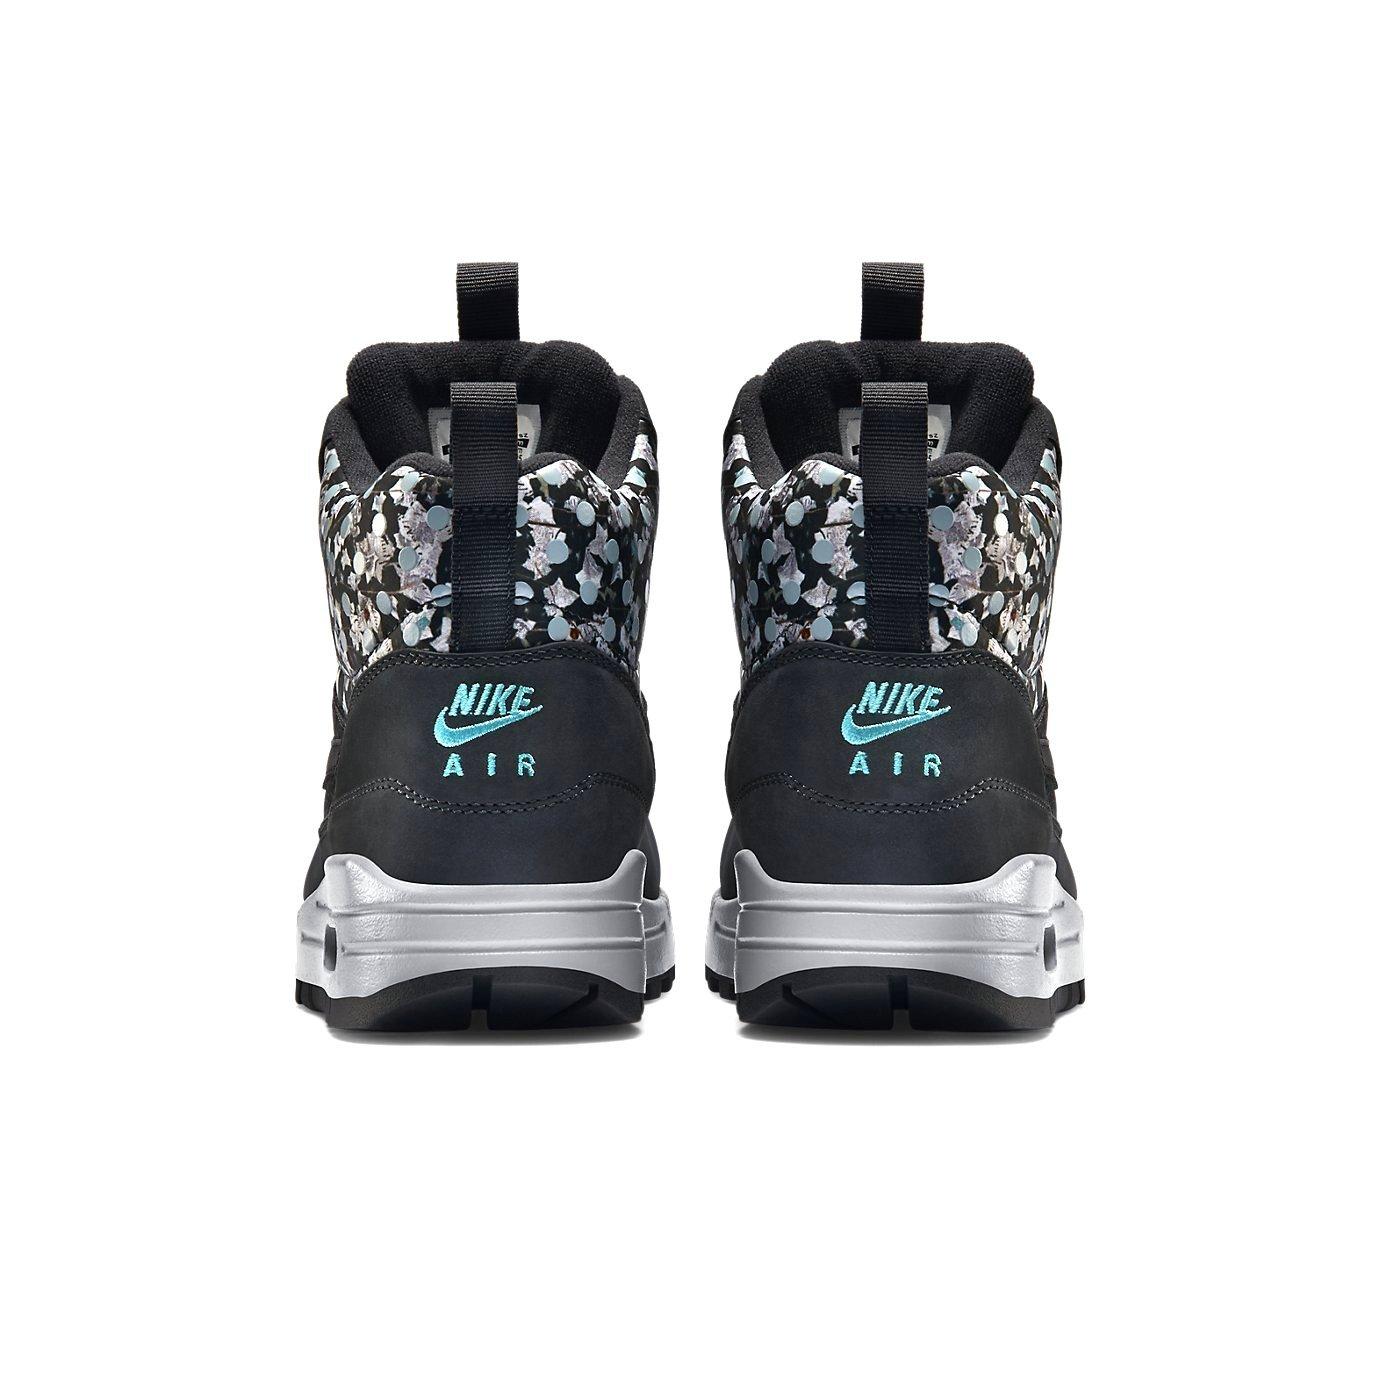 timeless design b6f6b a2a34 Nike Air Max 1 Mid Sneakerboot LB QS Womens Boot  Amazon.ca  Shoes    Handbags